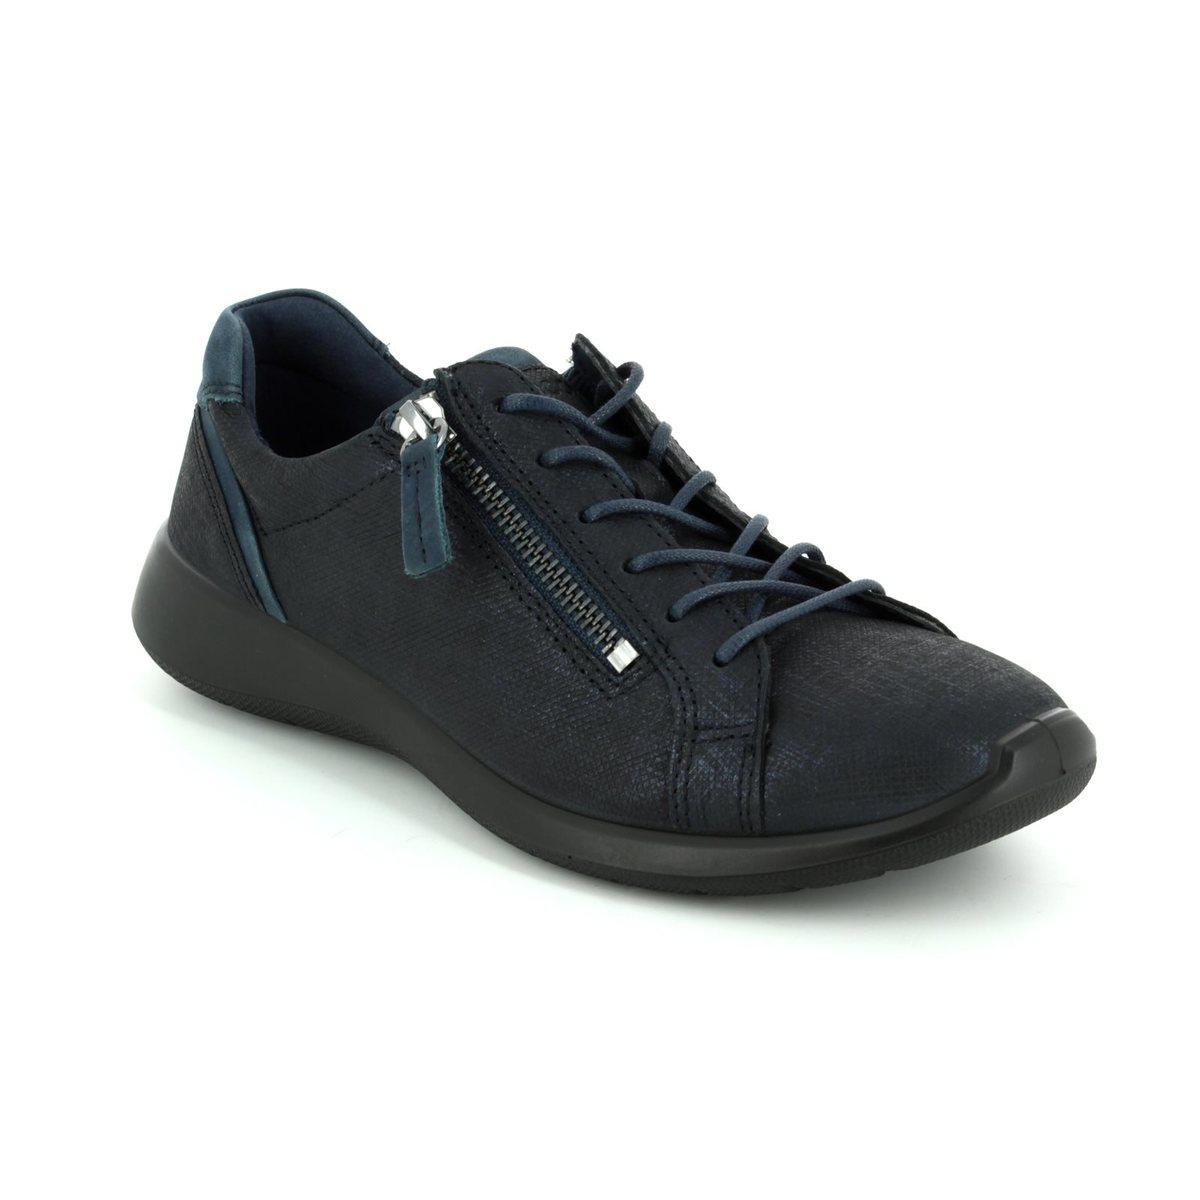 Ricosta Shoes Australia